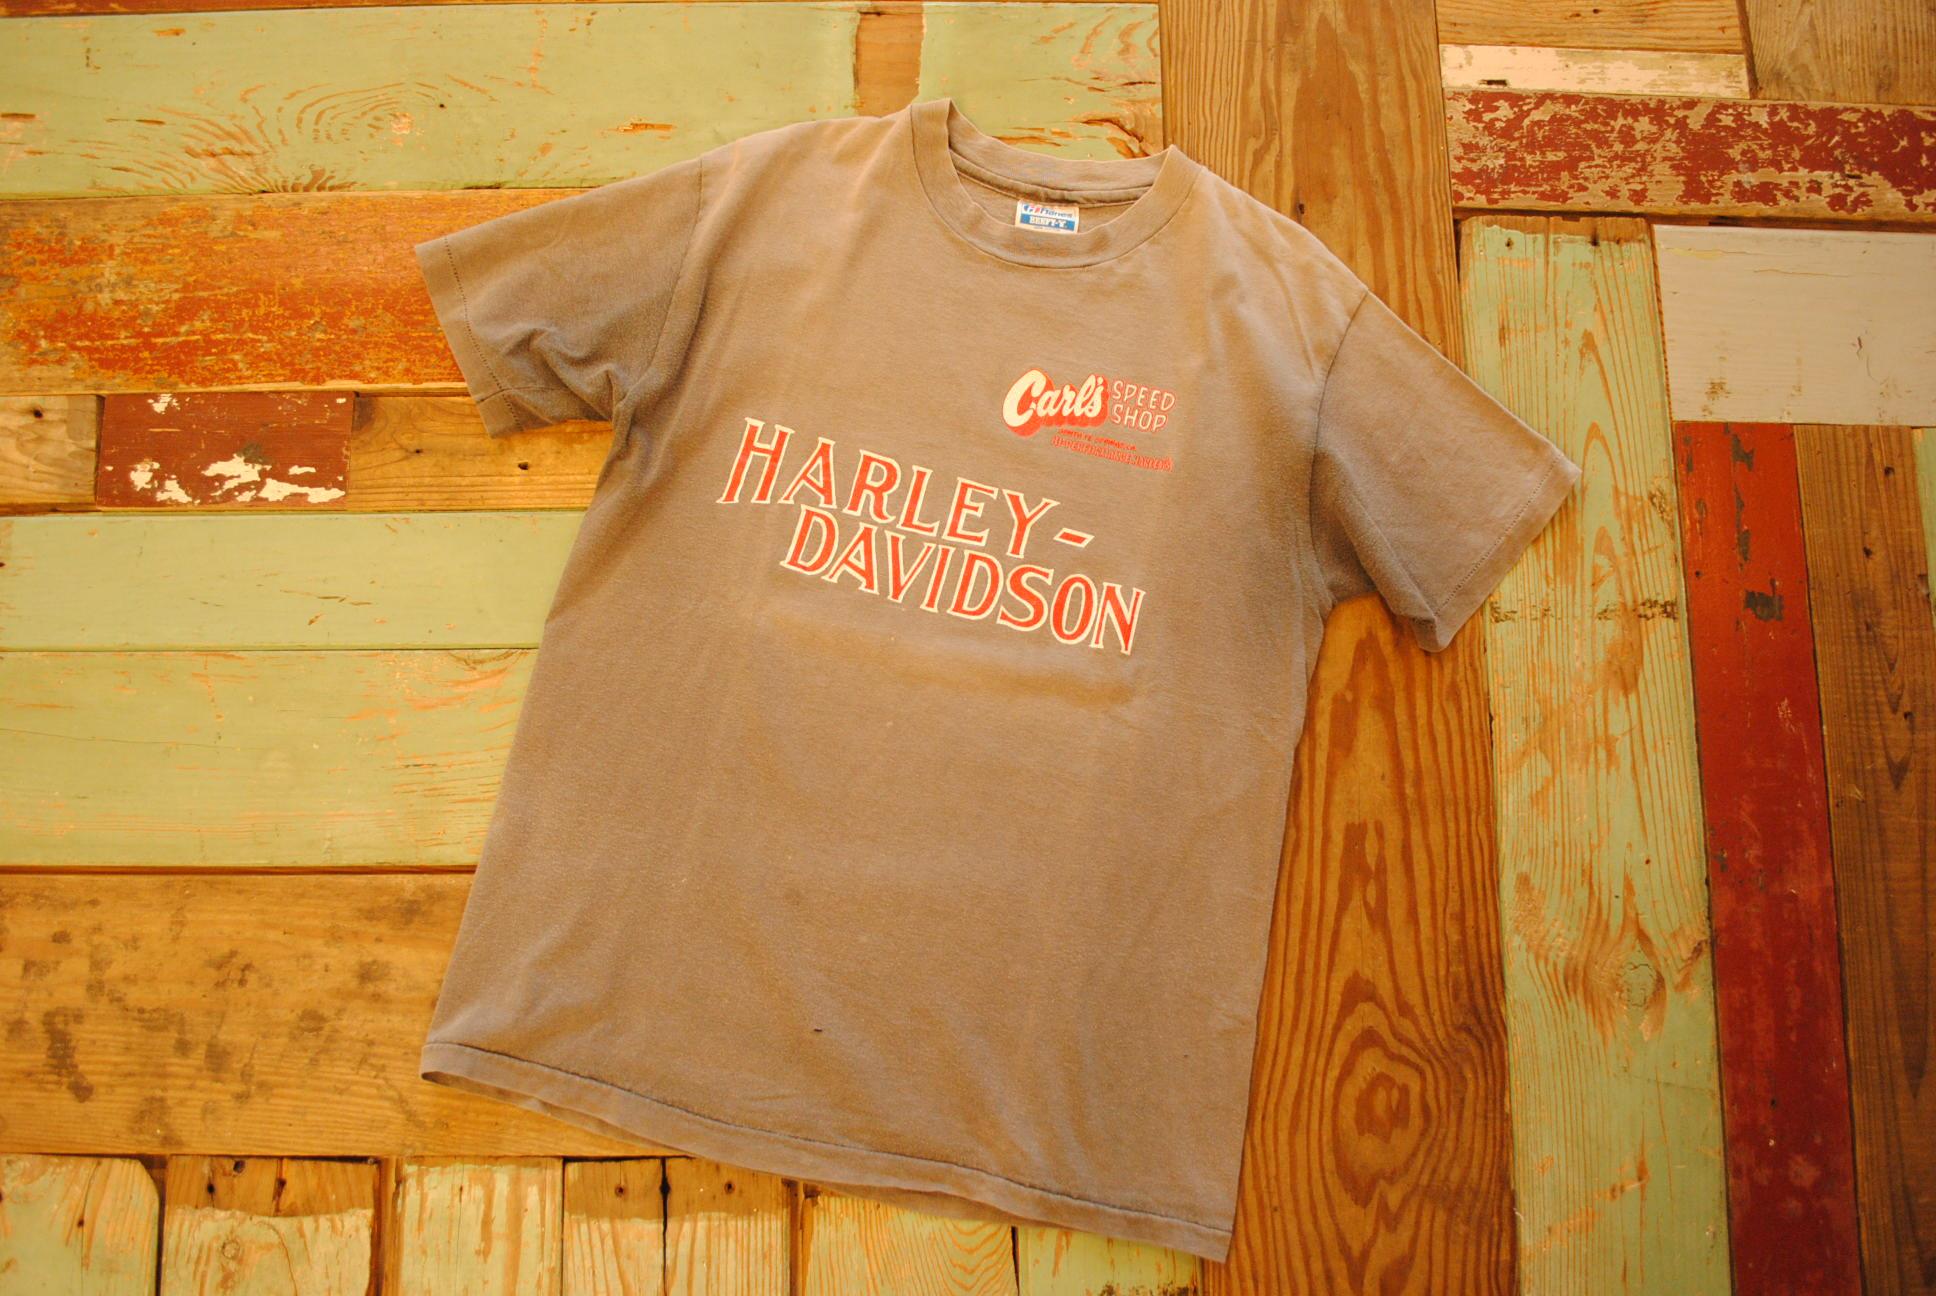 OLD T-SHIRTS -HARLEY DAVIDSON-_f0233425_23481053.jpg